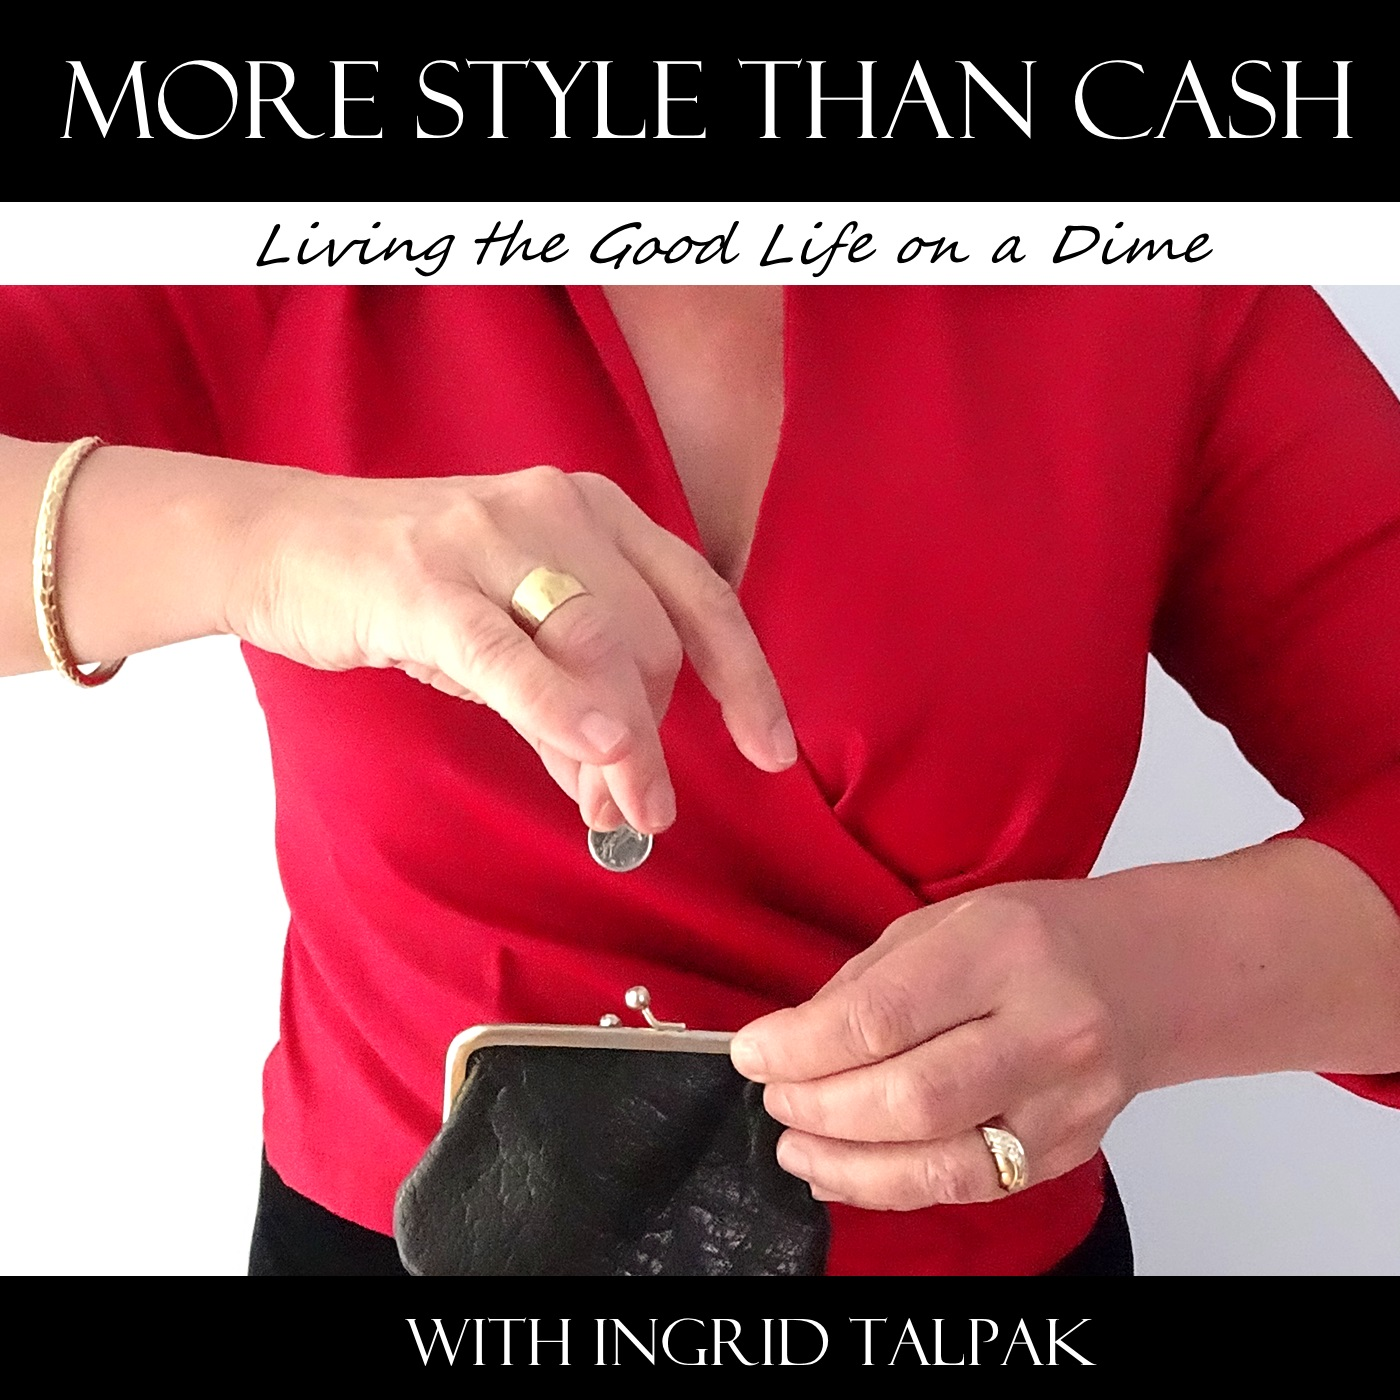 More Style Than Cash logo